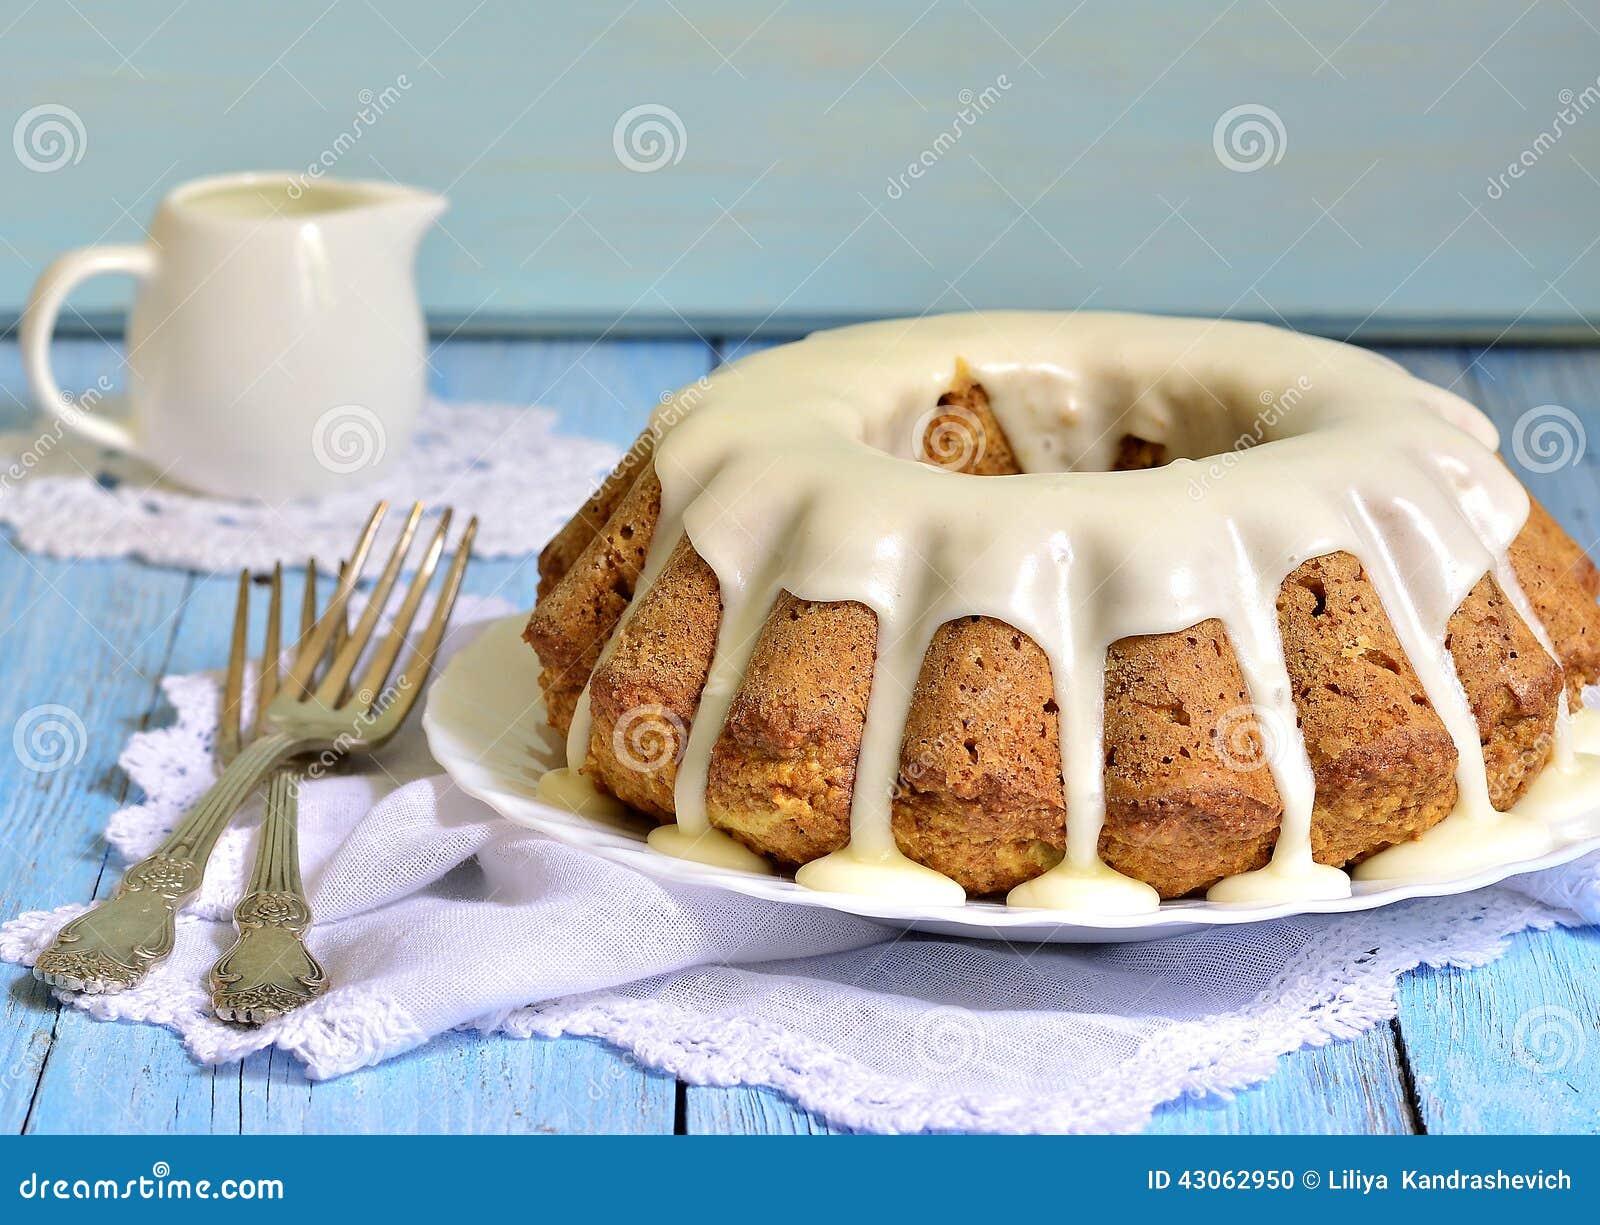 Carrot cake with cream glaze.